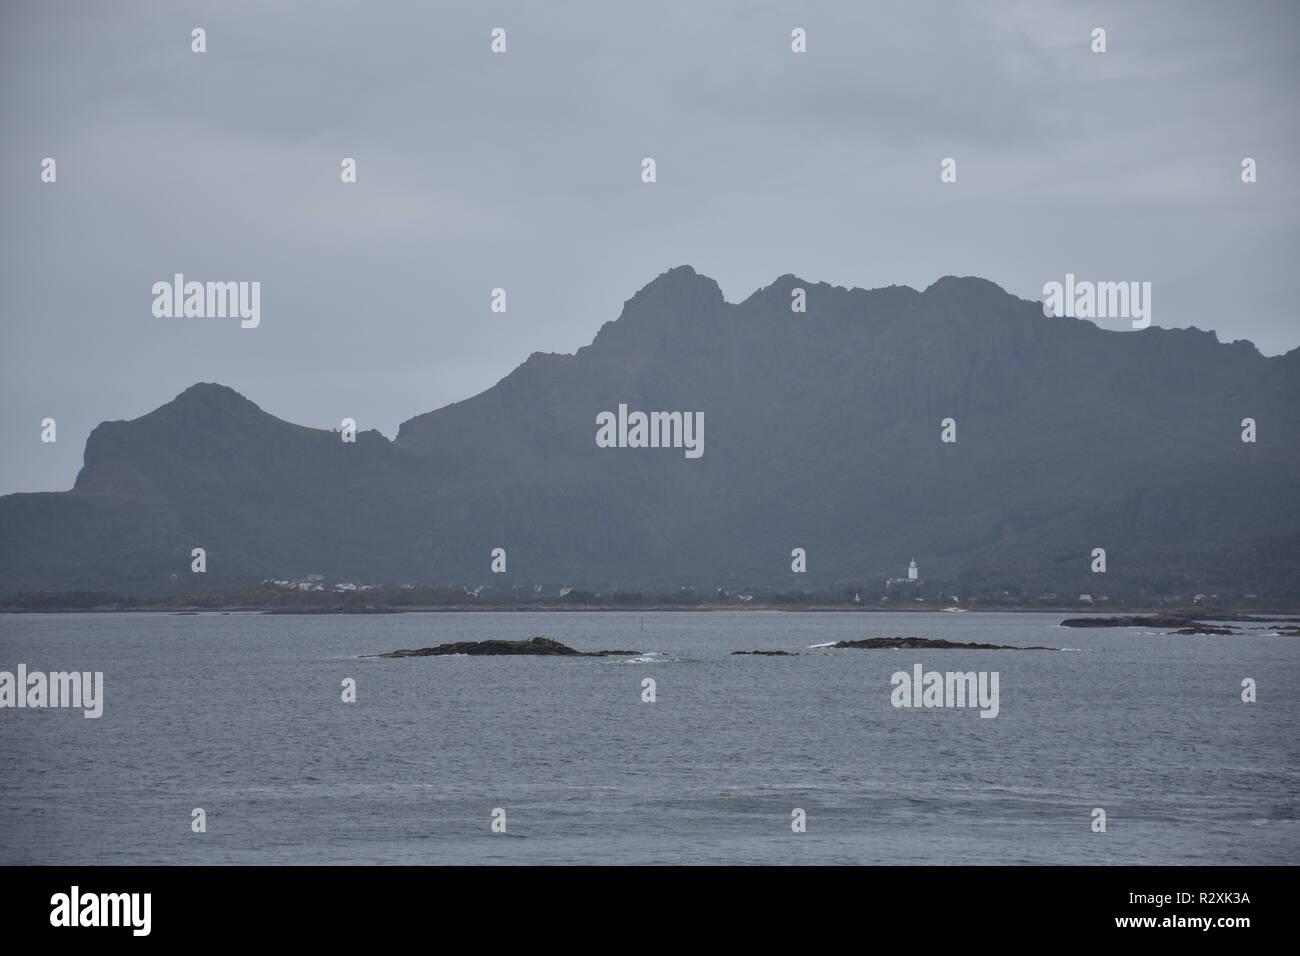 Norwegen, Lofoten, Rekdal, Leknes, Küste, Steinküste, Brandung, Sturm, Herbst, Vestvagøy, Sundklakkstraumen, Straumen, Atlantik, Atlantikküste, Nordla - Stock Image